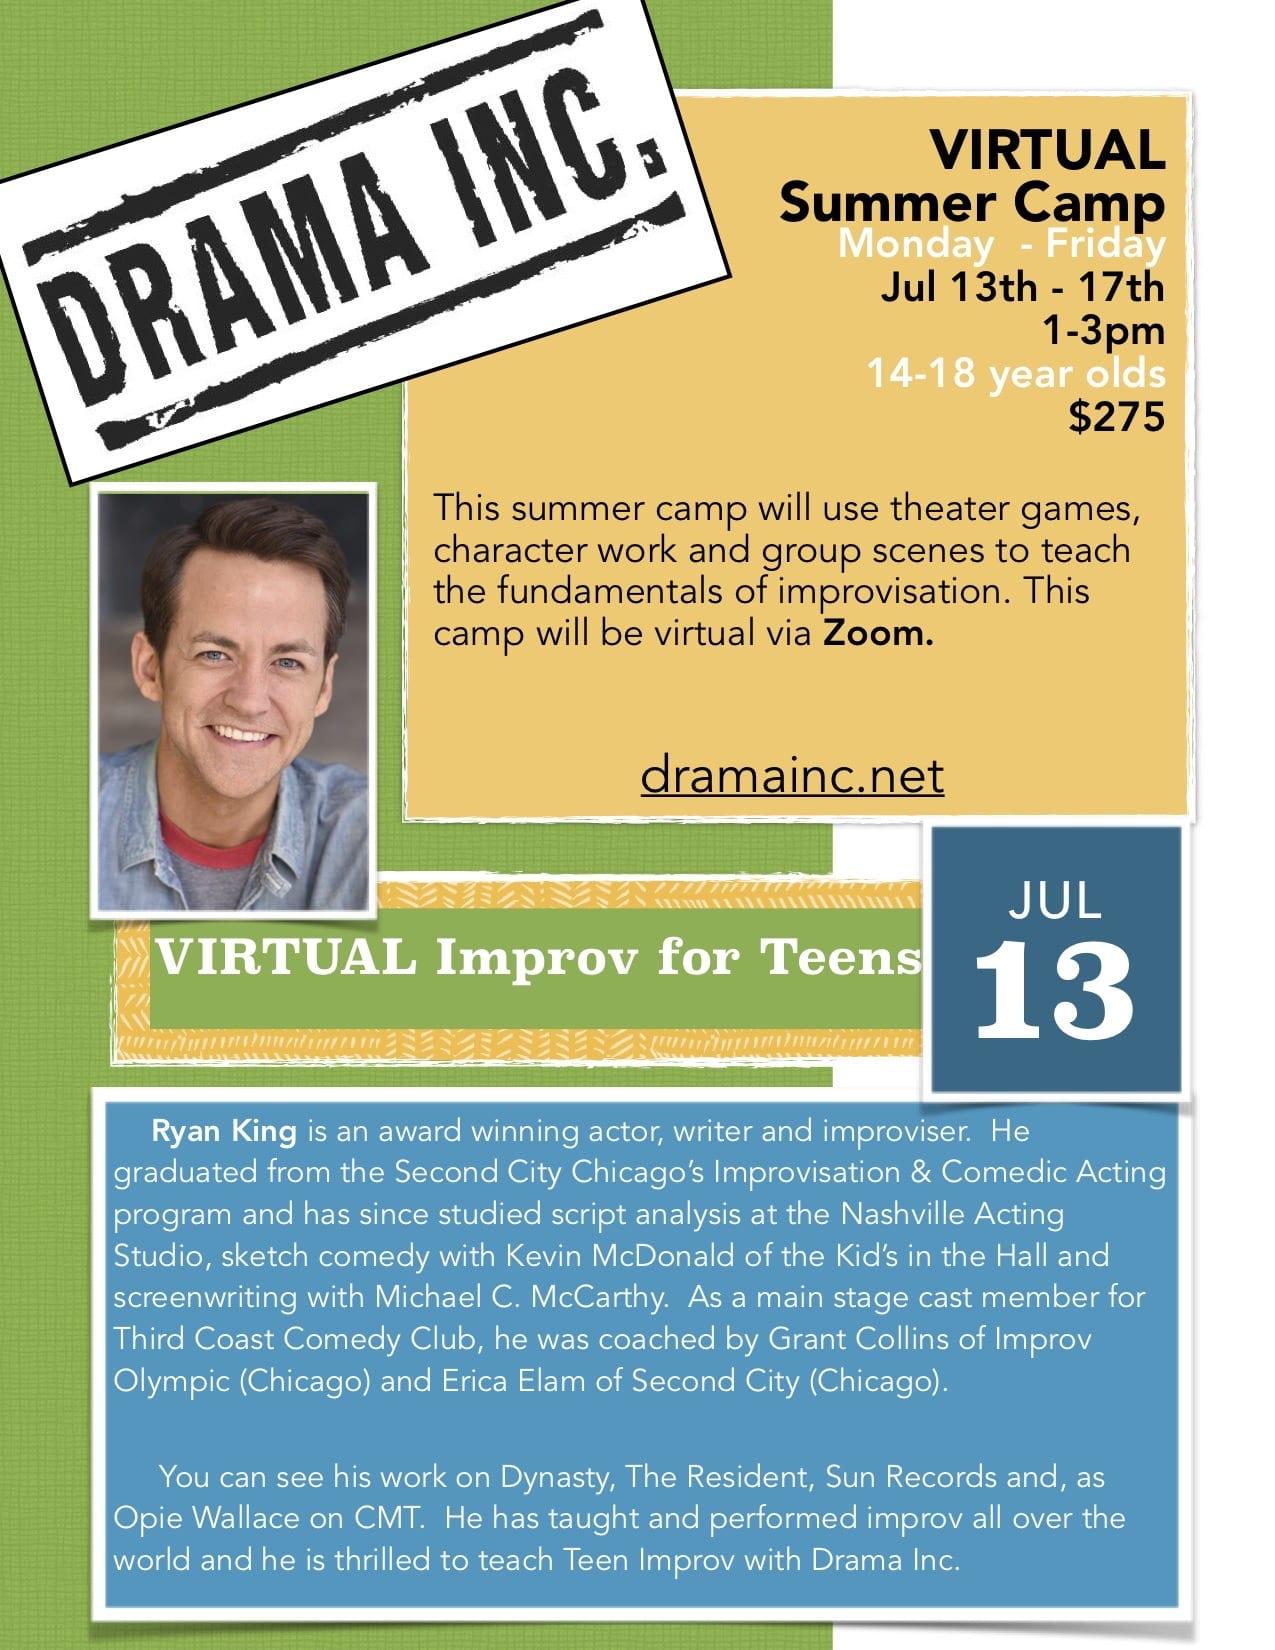 Teen Improv Virtual Summer Camp